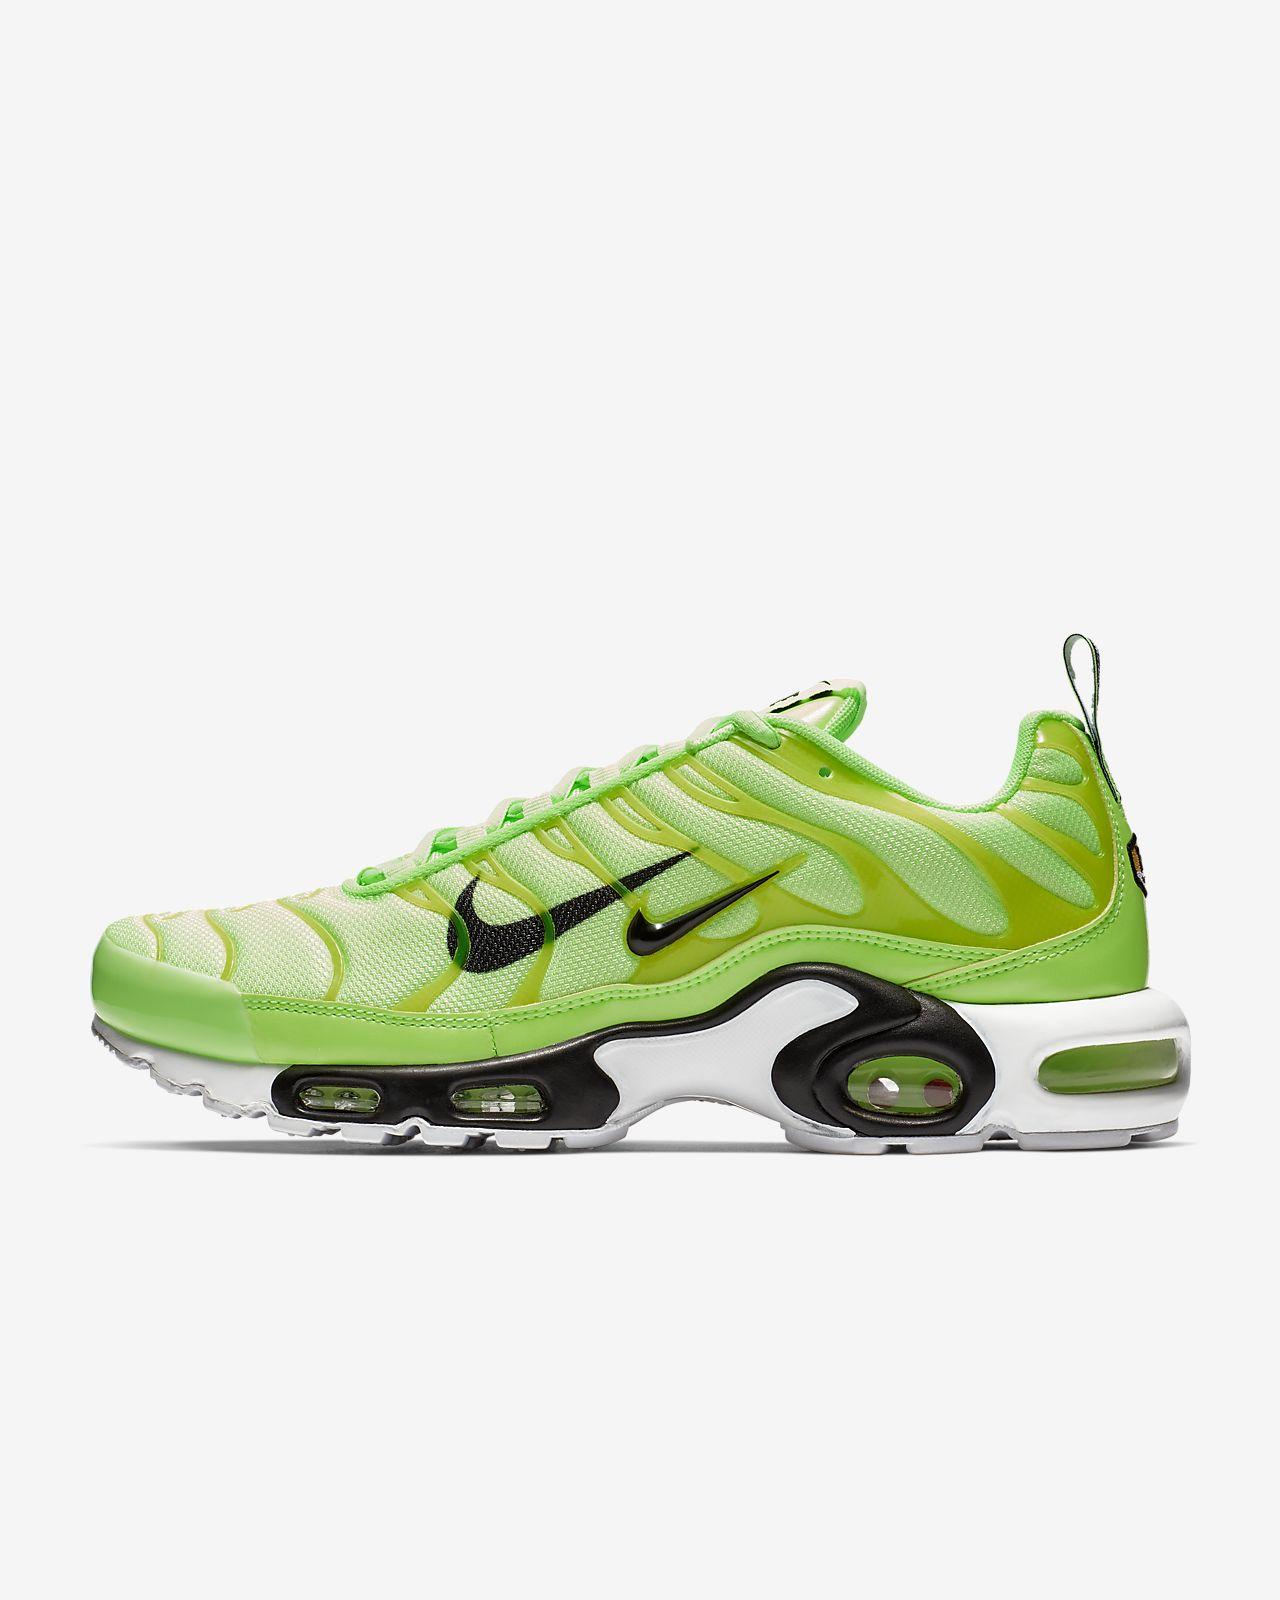 san francisco recognized brands various colors Nike Air Max Plus Premium Men's Shoe